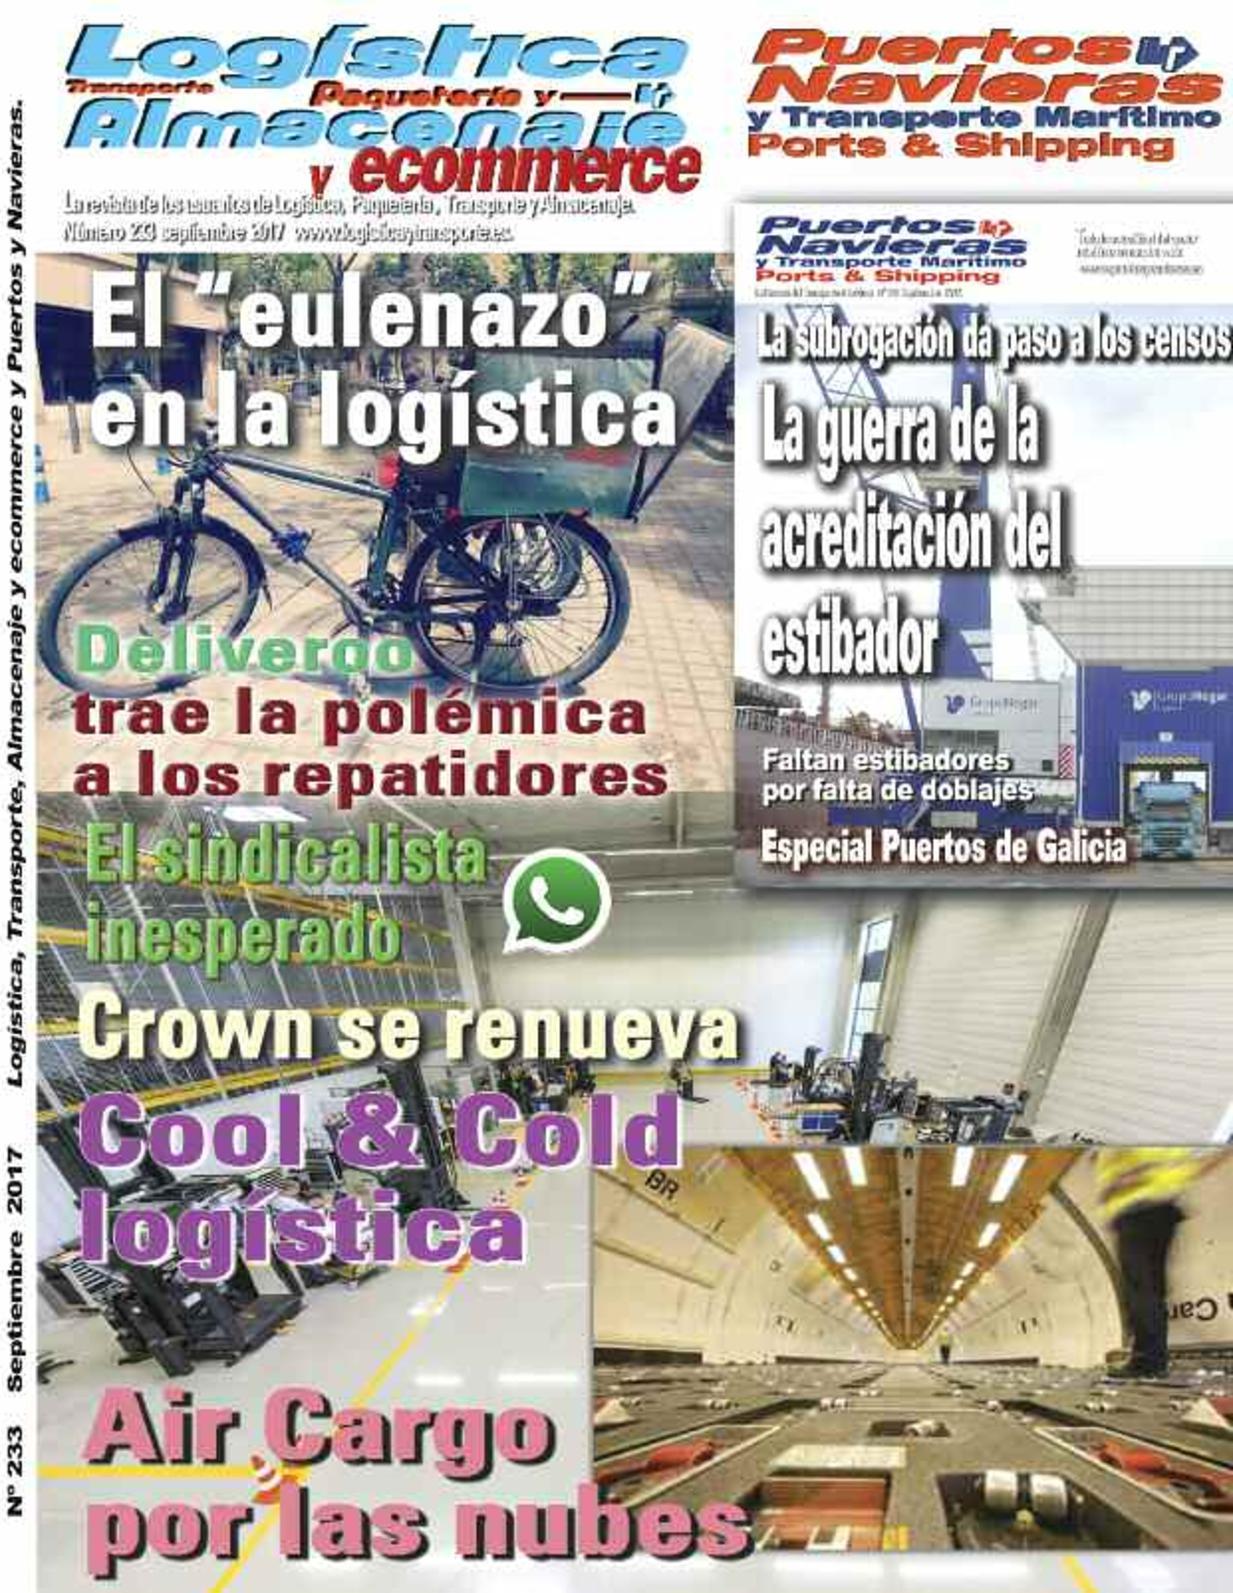 Calaméo - Logística Transporte y Almacenaje (Septiembre 2017)